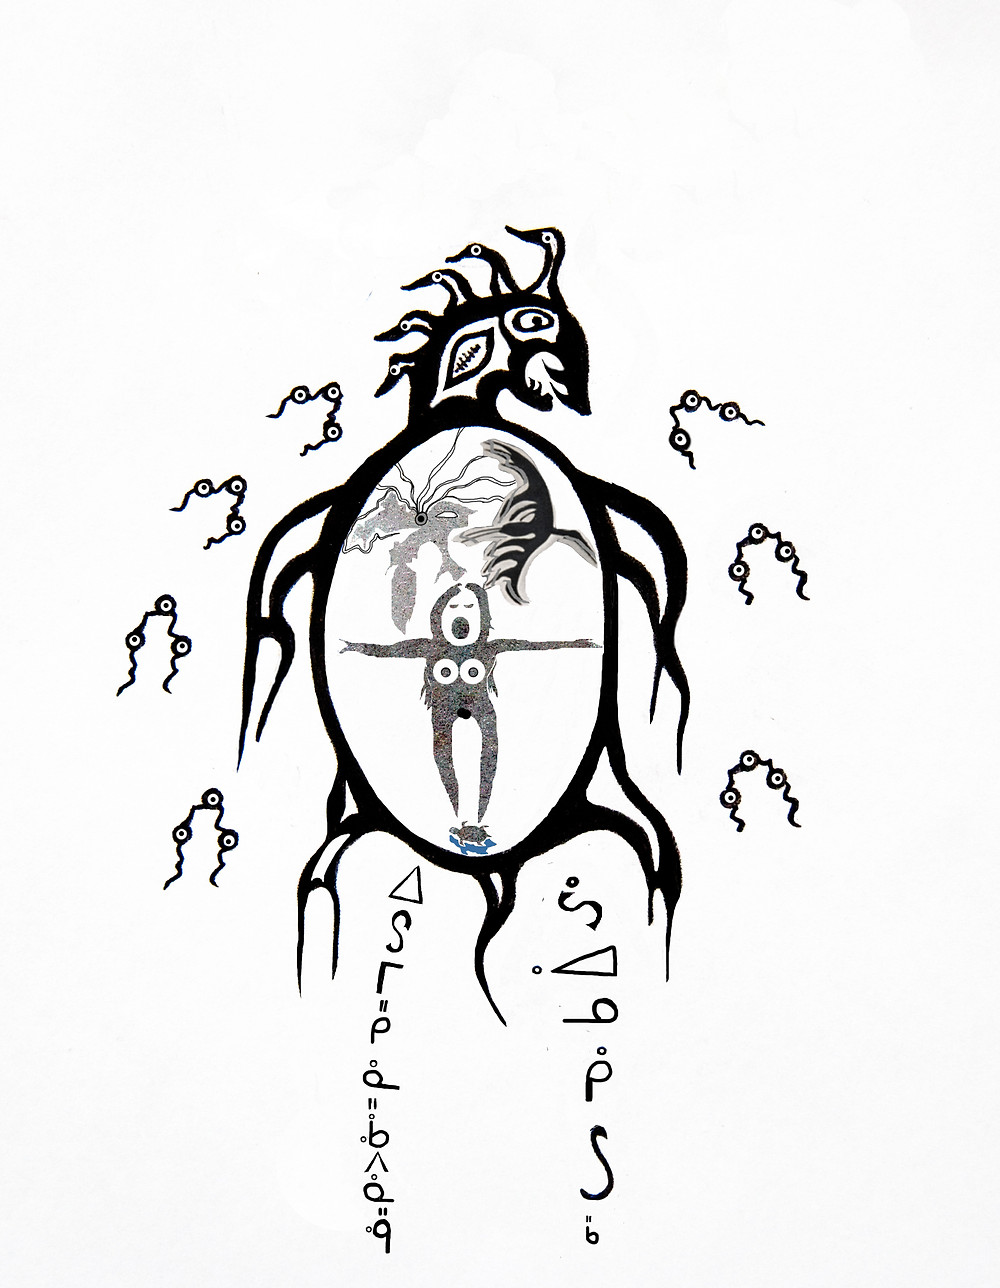 Izhimikinaakaabinakwe Turtle Woman's Dream